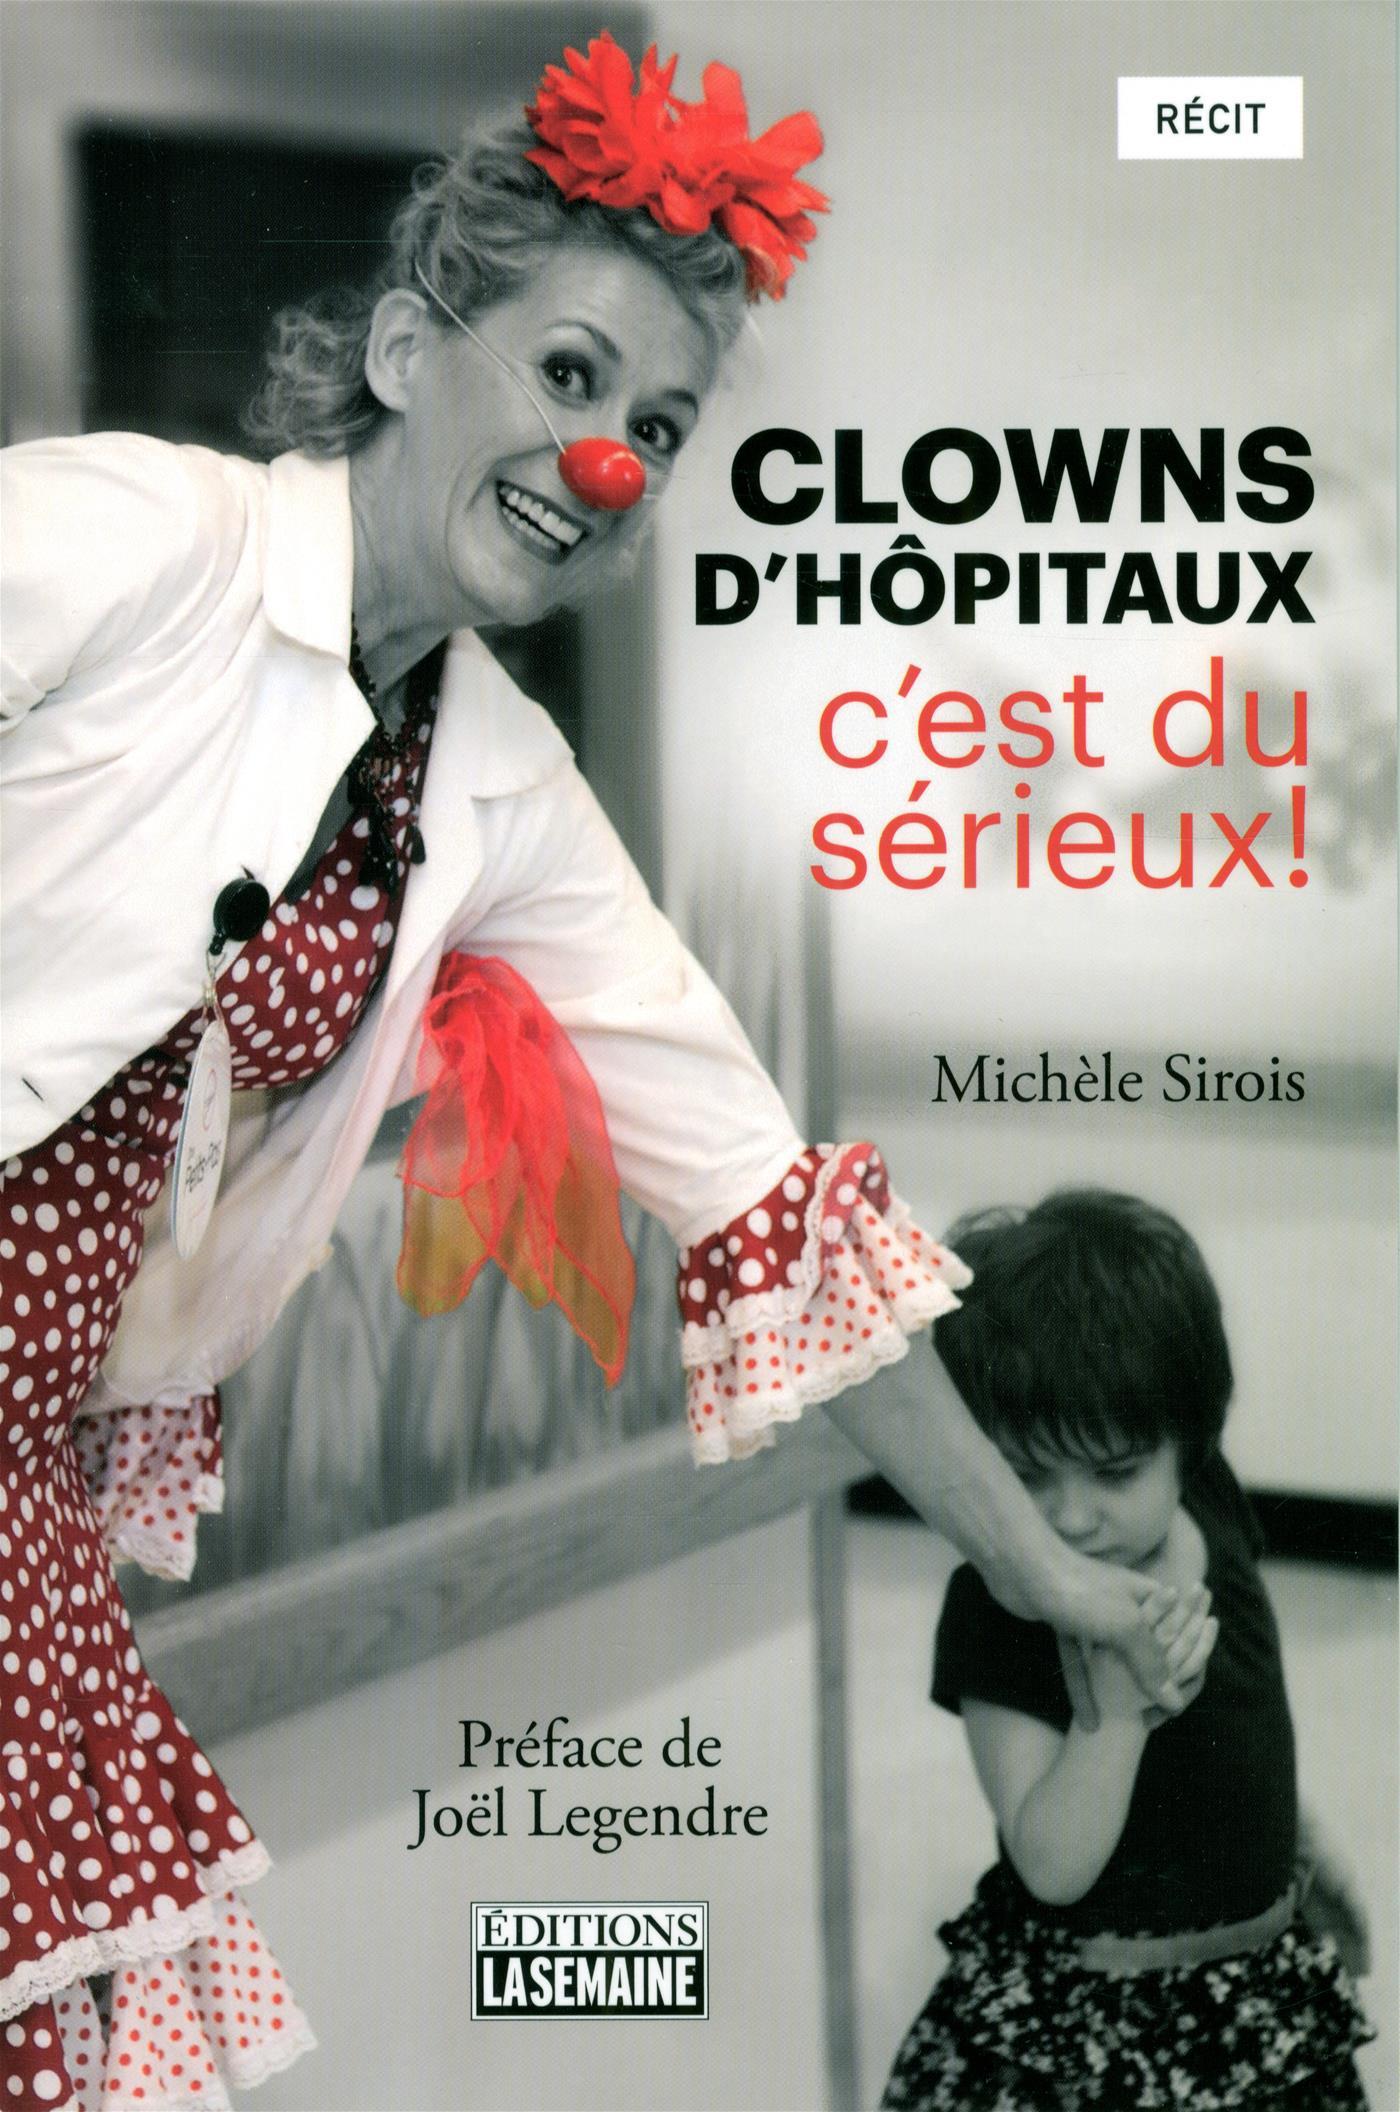 Clowns d'hôpitaux